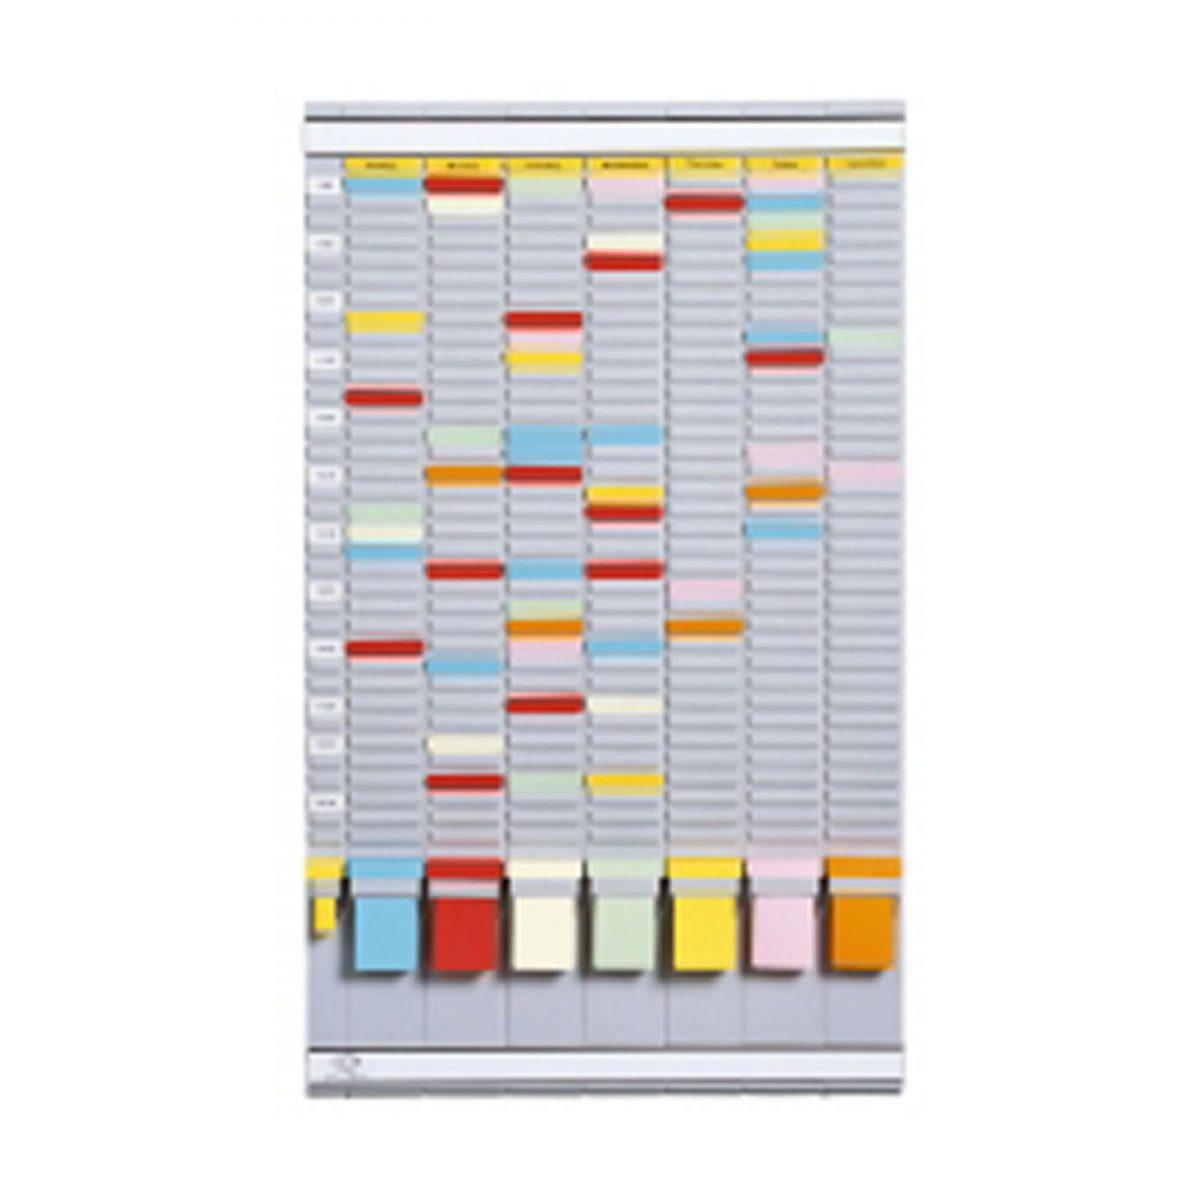 Planner saptamanal cu T-cards, cu 35 de slot-uri, complet, JALEMA - gri deschis